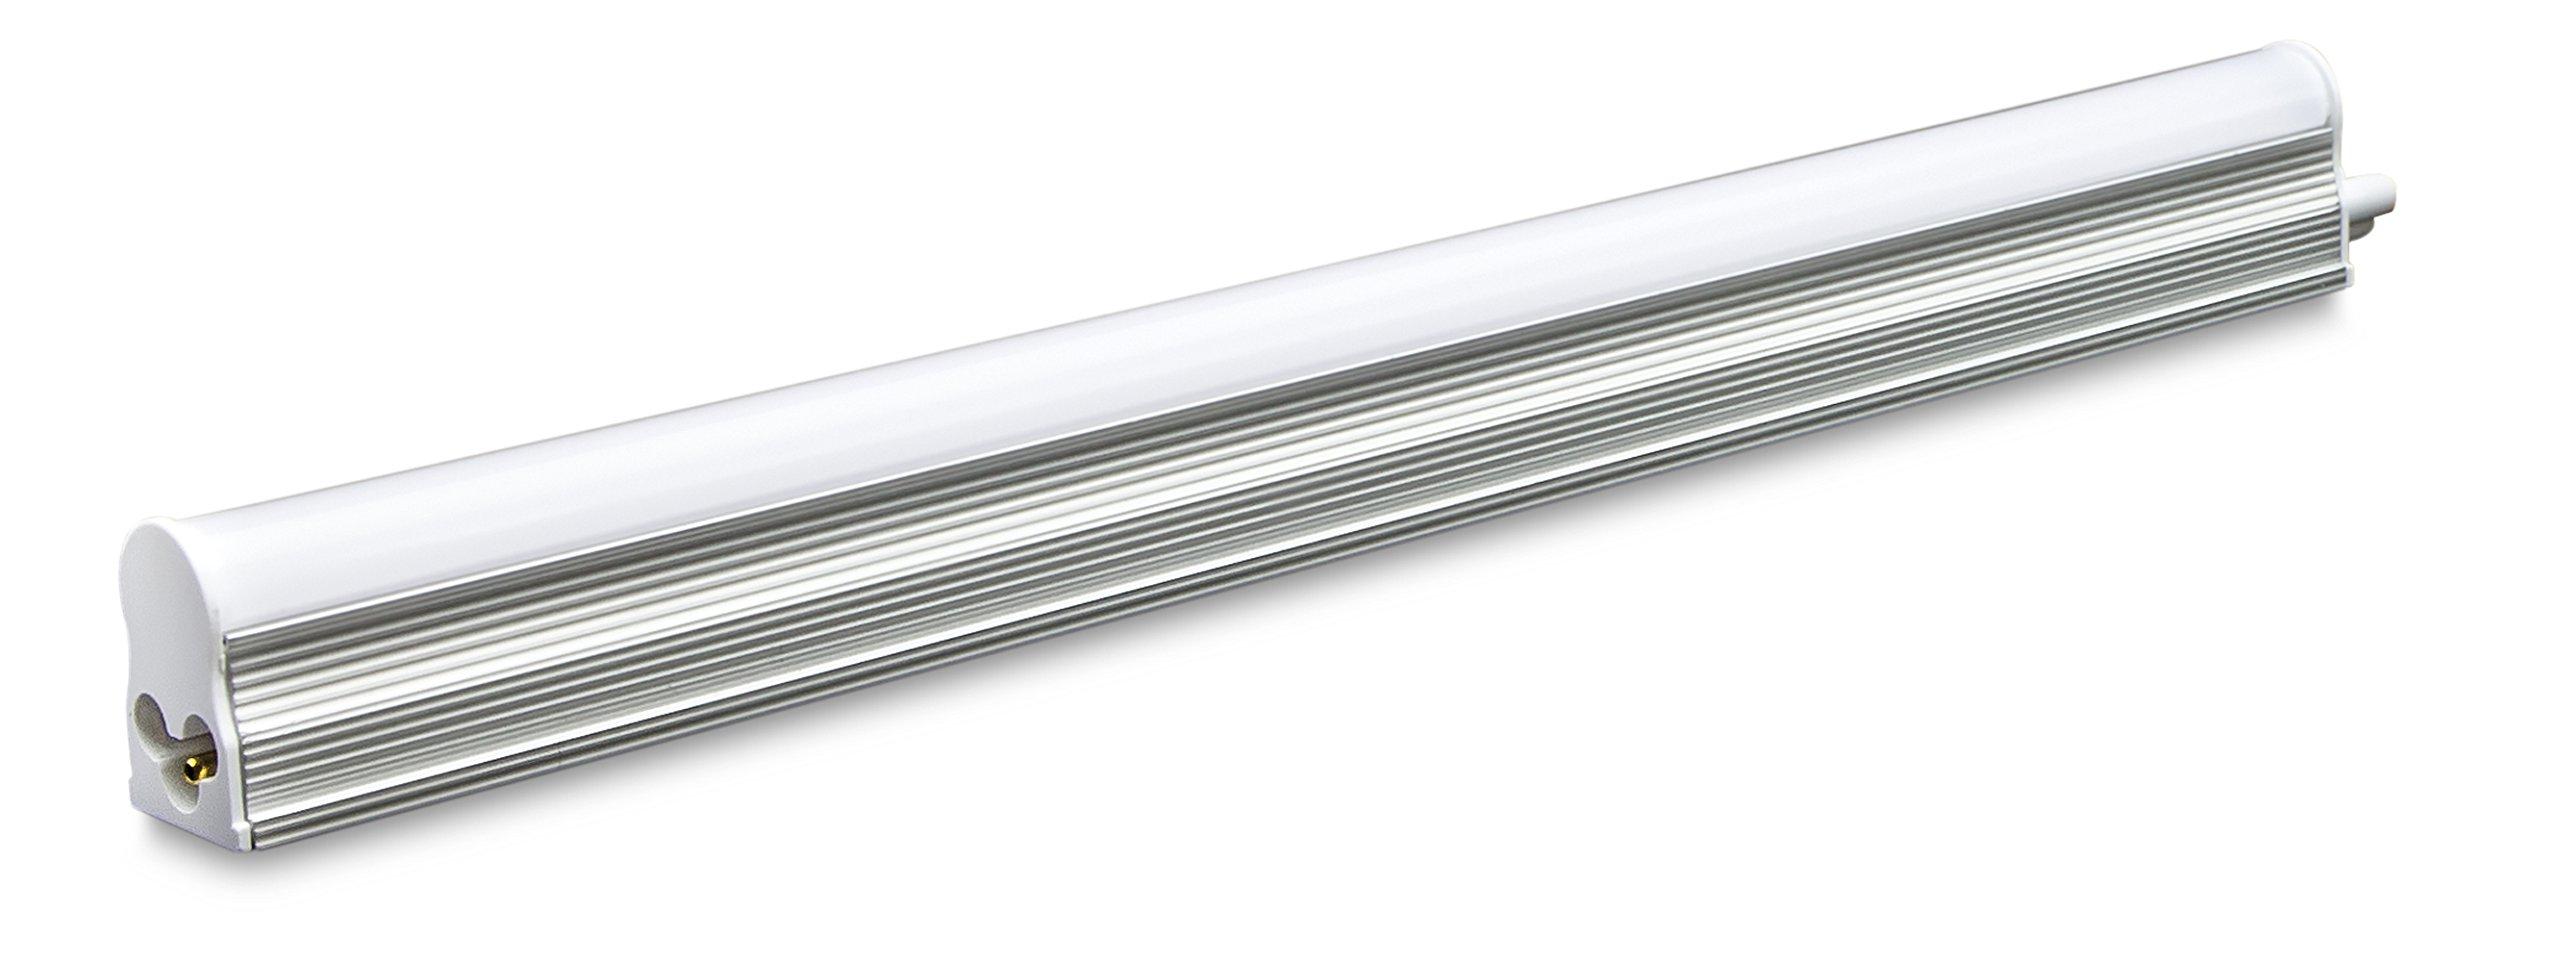 Forest Lighting T5N130 3000K 5W LED Integrated T5 Tube Light (40 Pack), 1' by Forest Lighting